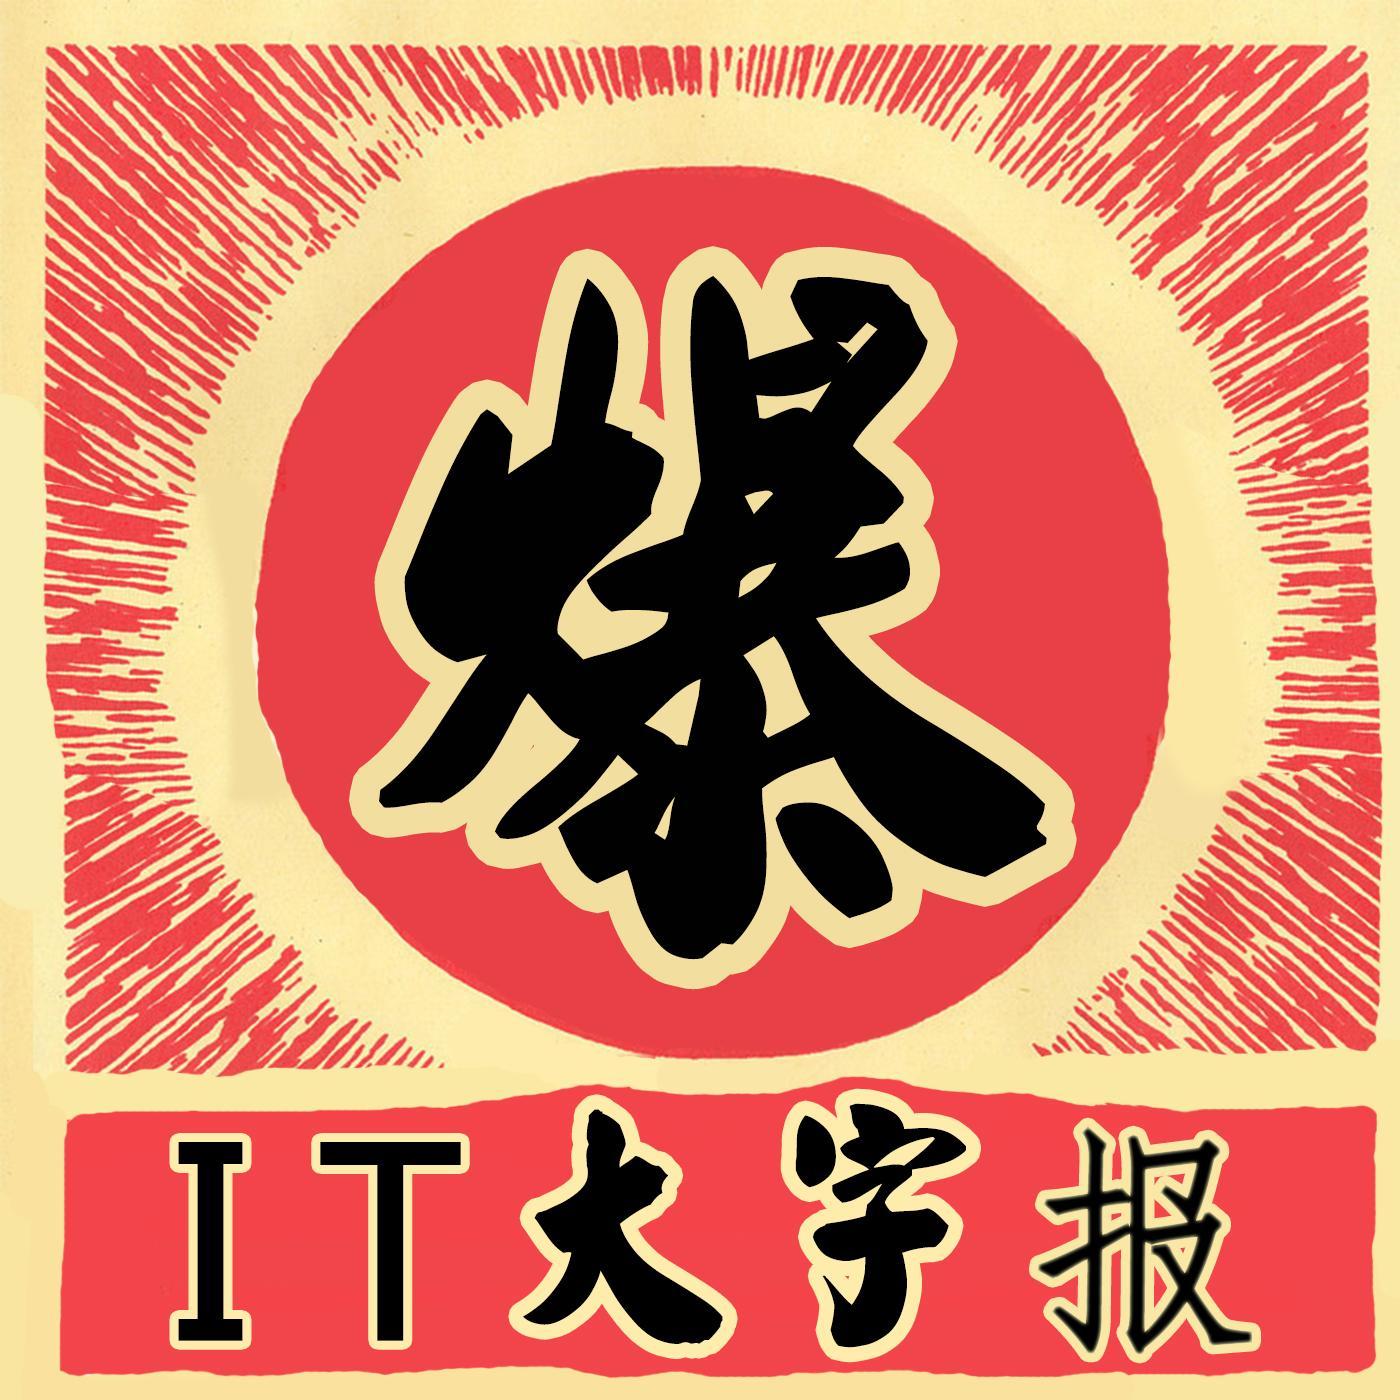 <![CDATA[IT大字报【HeaPot出品】]]>